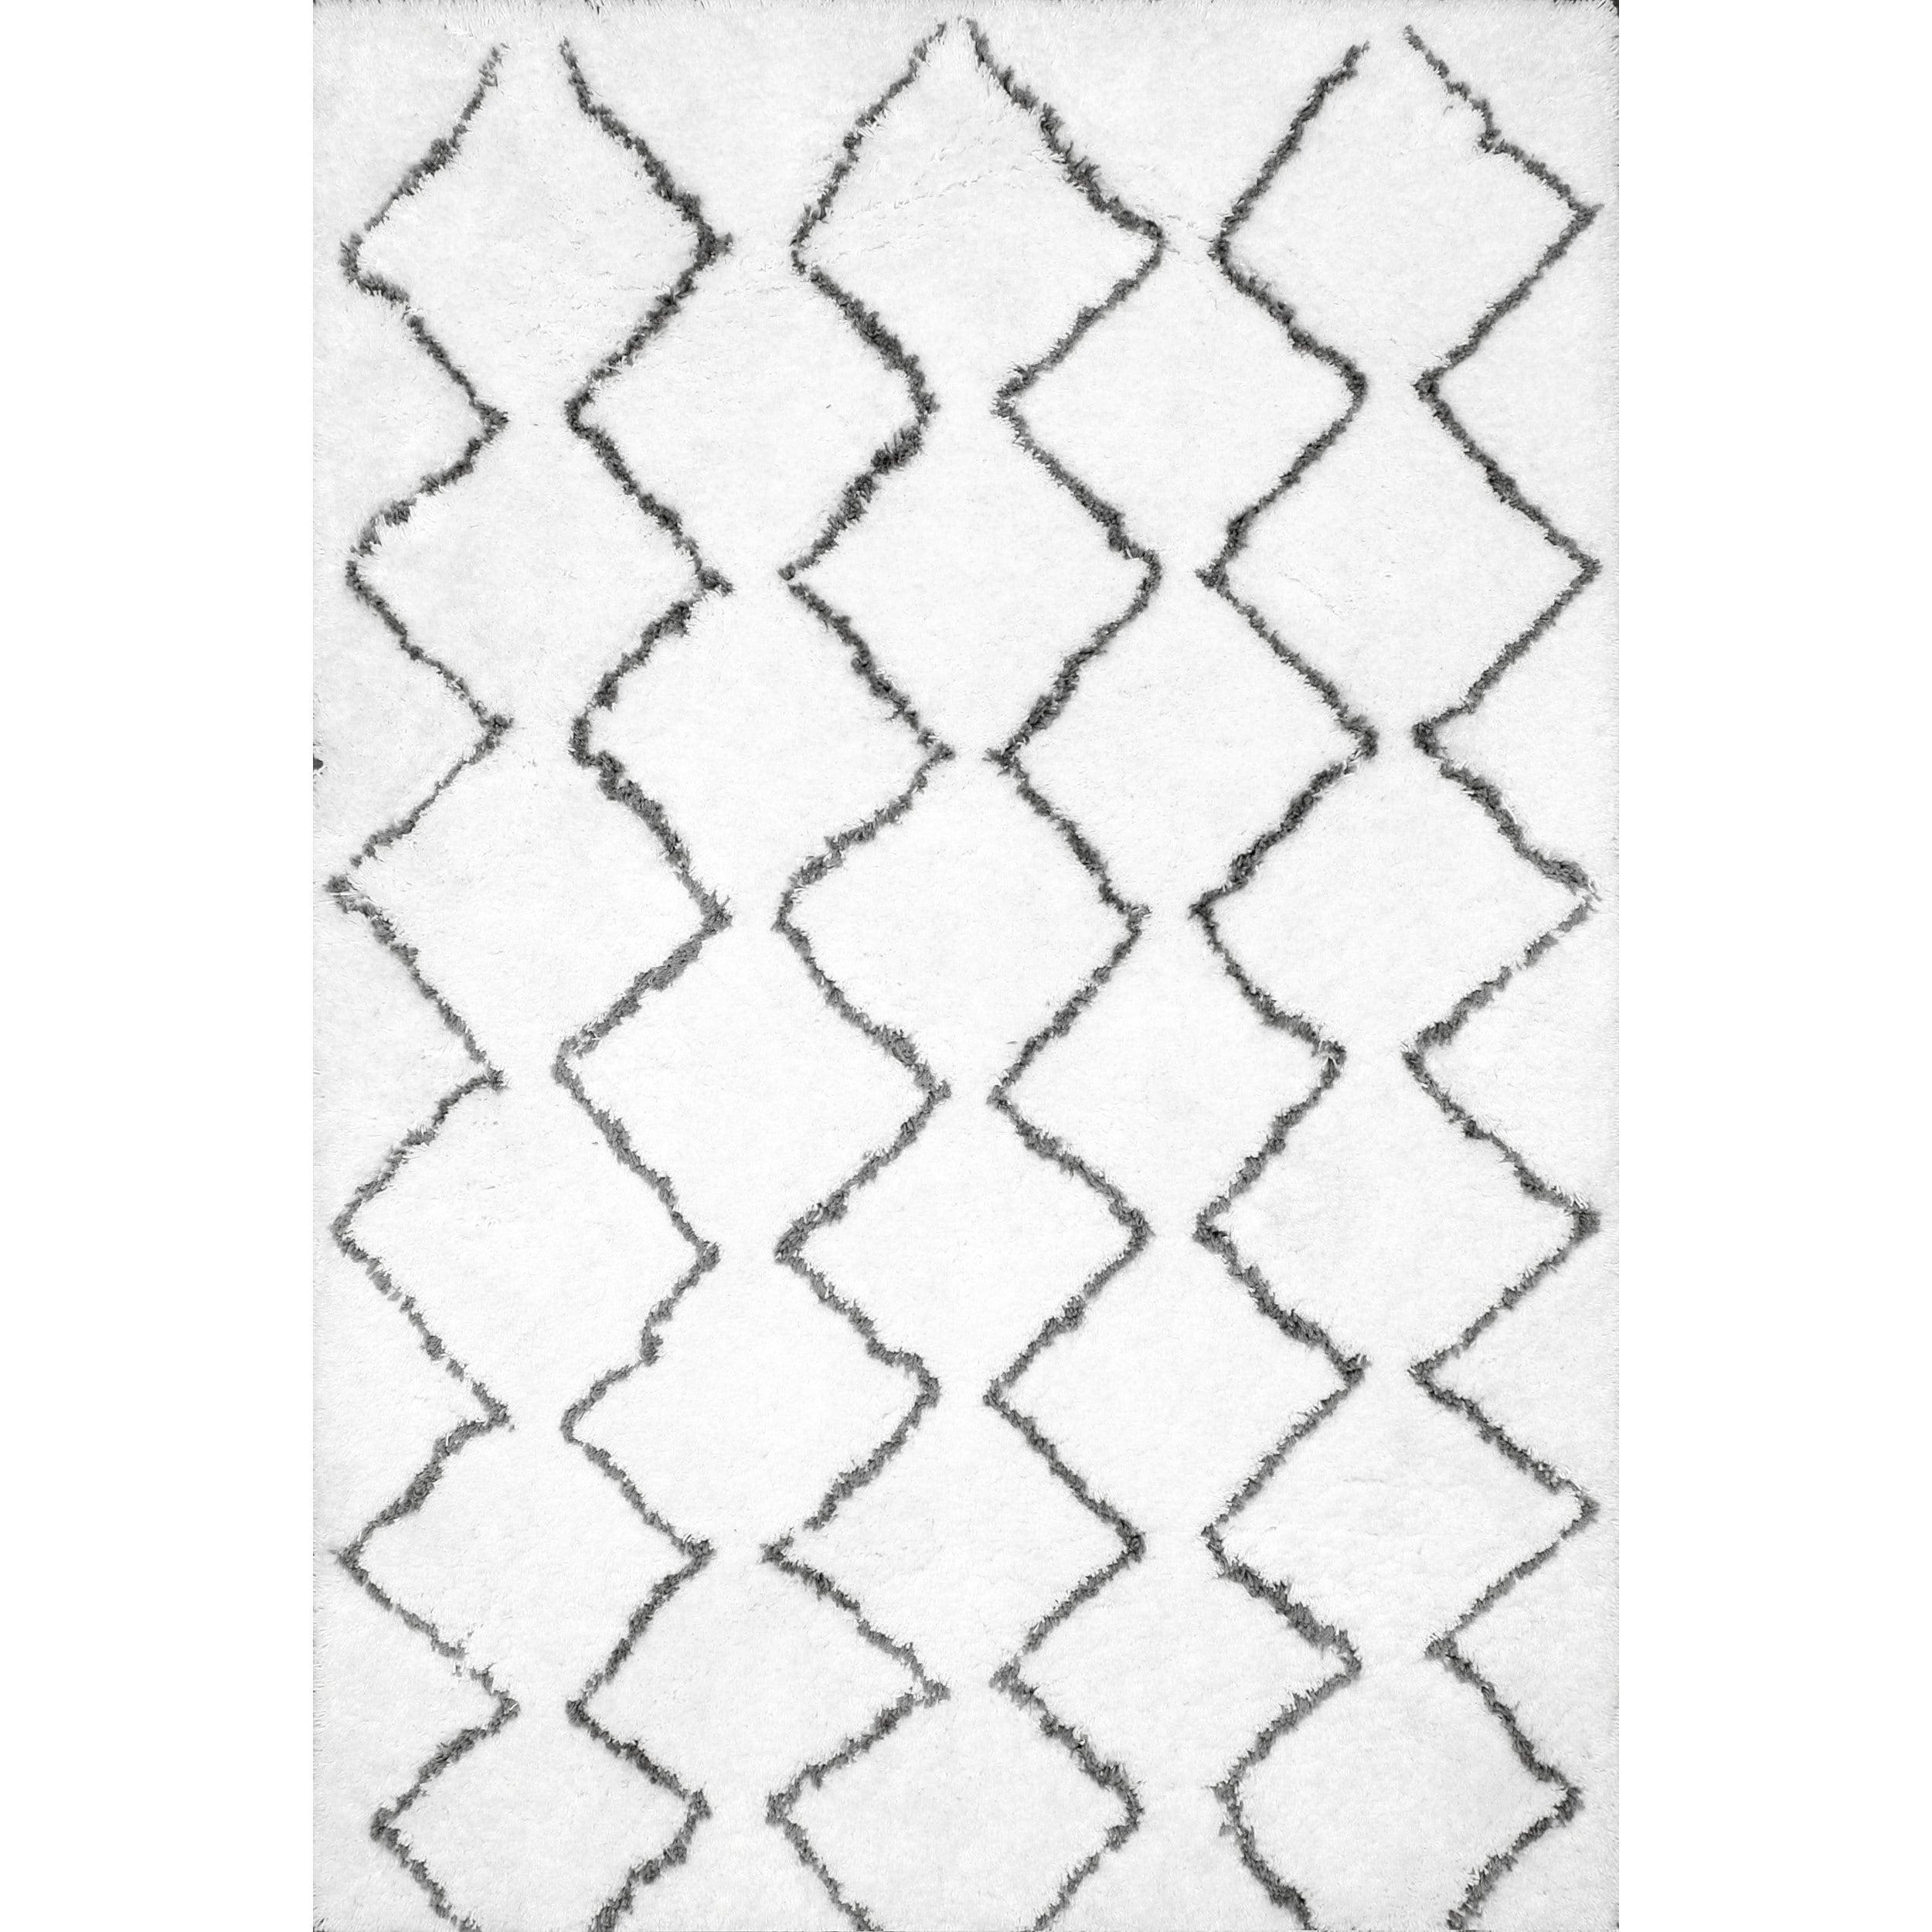 shop nuloom handmade moroccan trellis shag rug 3 6 x 5 6 3 6 x 1970s Home Decor shop nuloom handmade moroccan trellis shag rug 3 6 x 5 6 3 6 x 5 6 on sale free shipping today overstock 12404830